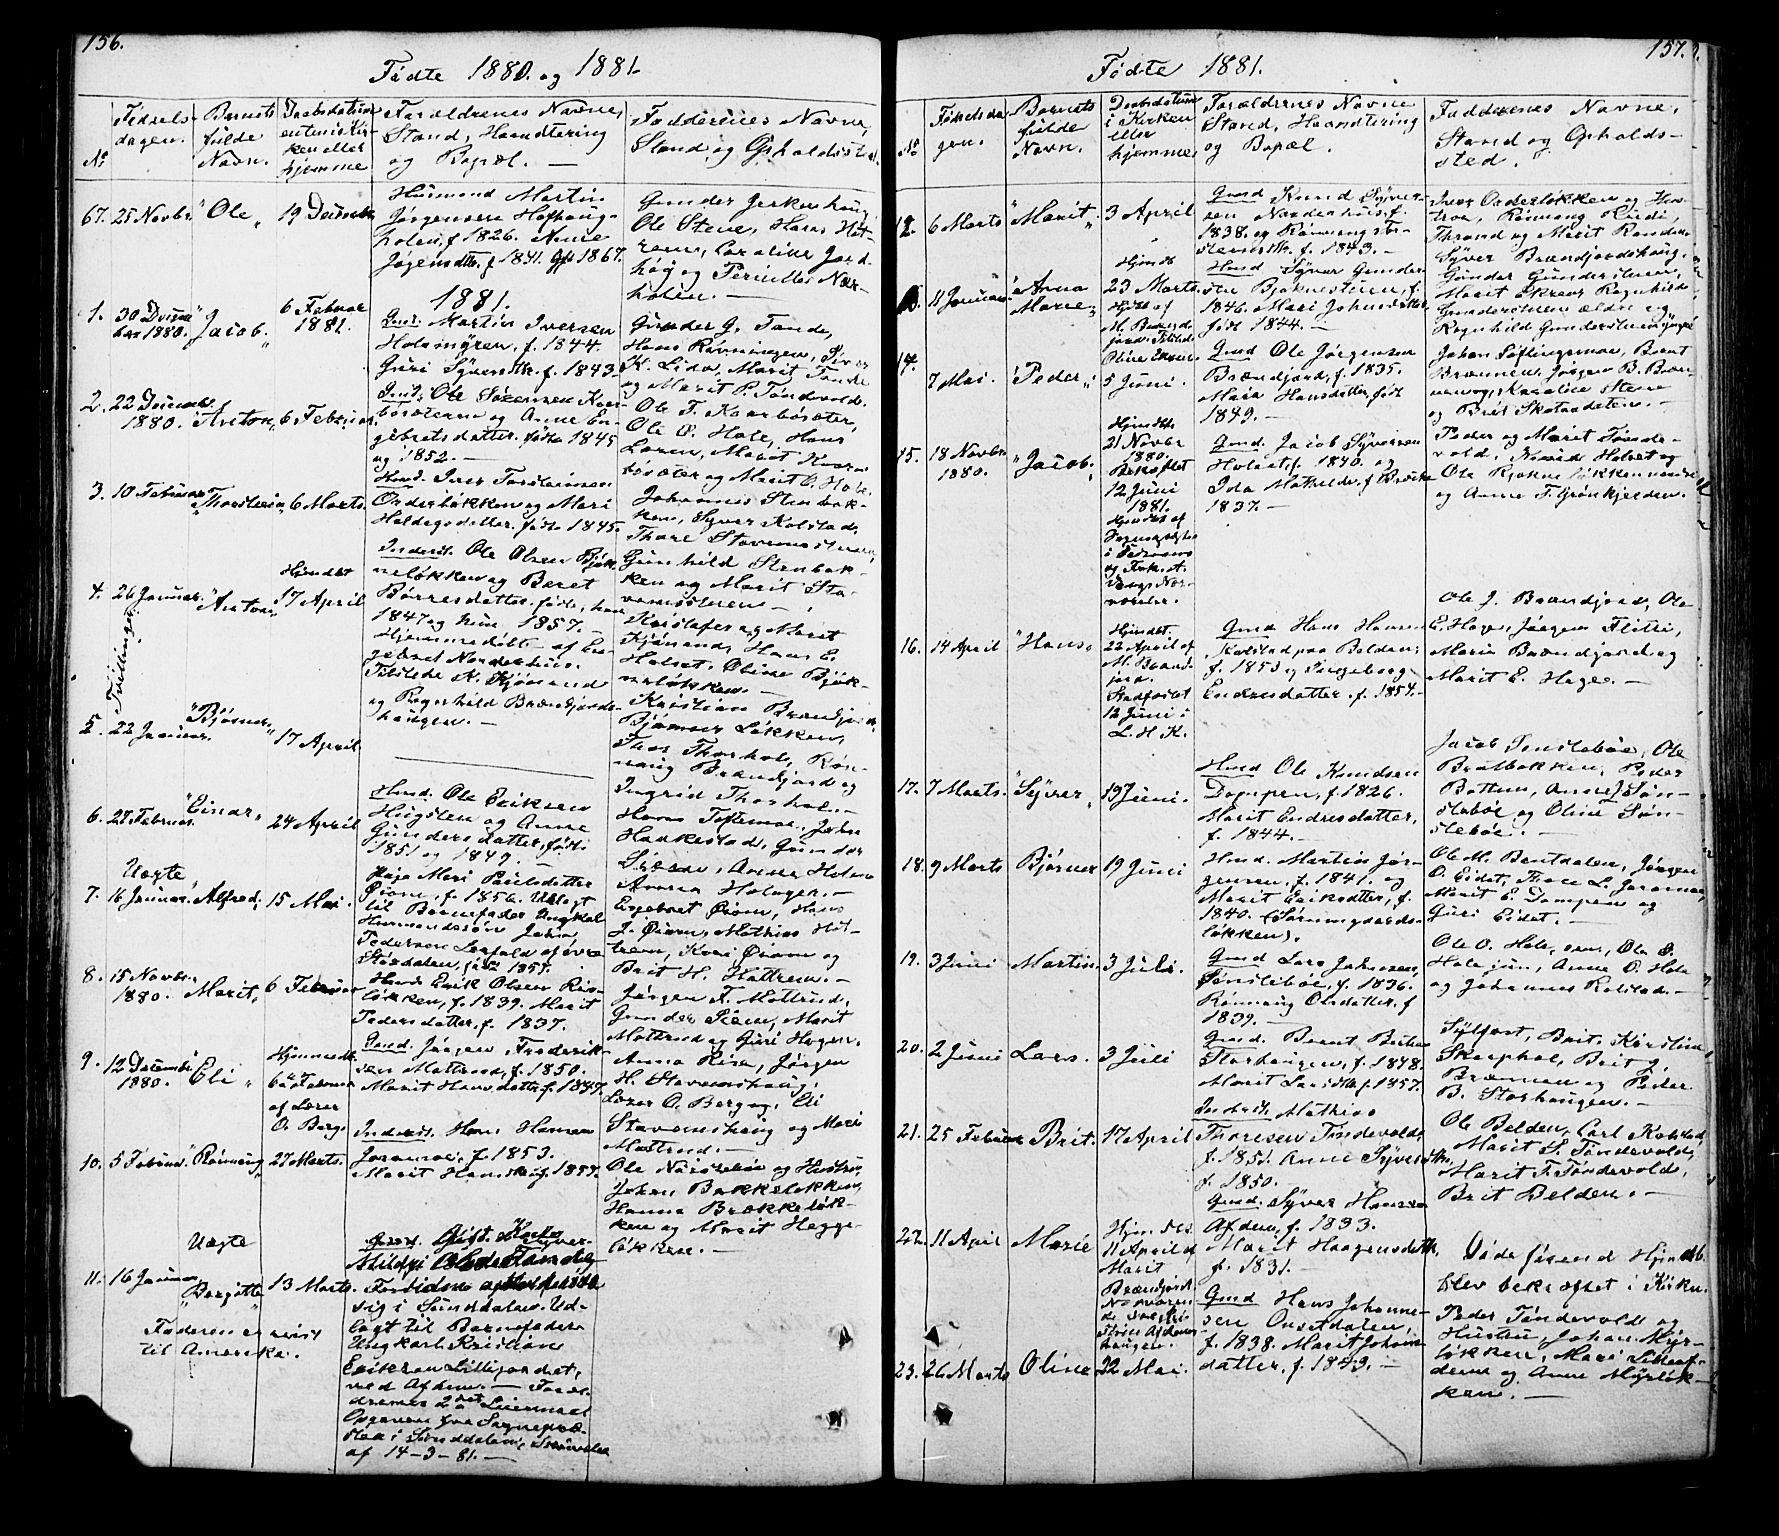 SAH, Lesja prestekontor, Klokkerbok nr. 5, 1850-1894, s. 156-157